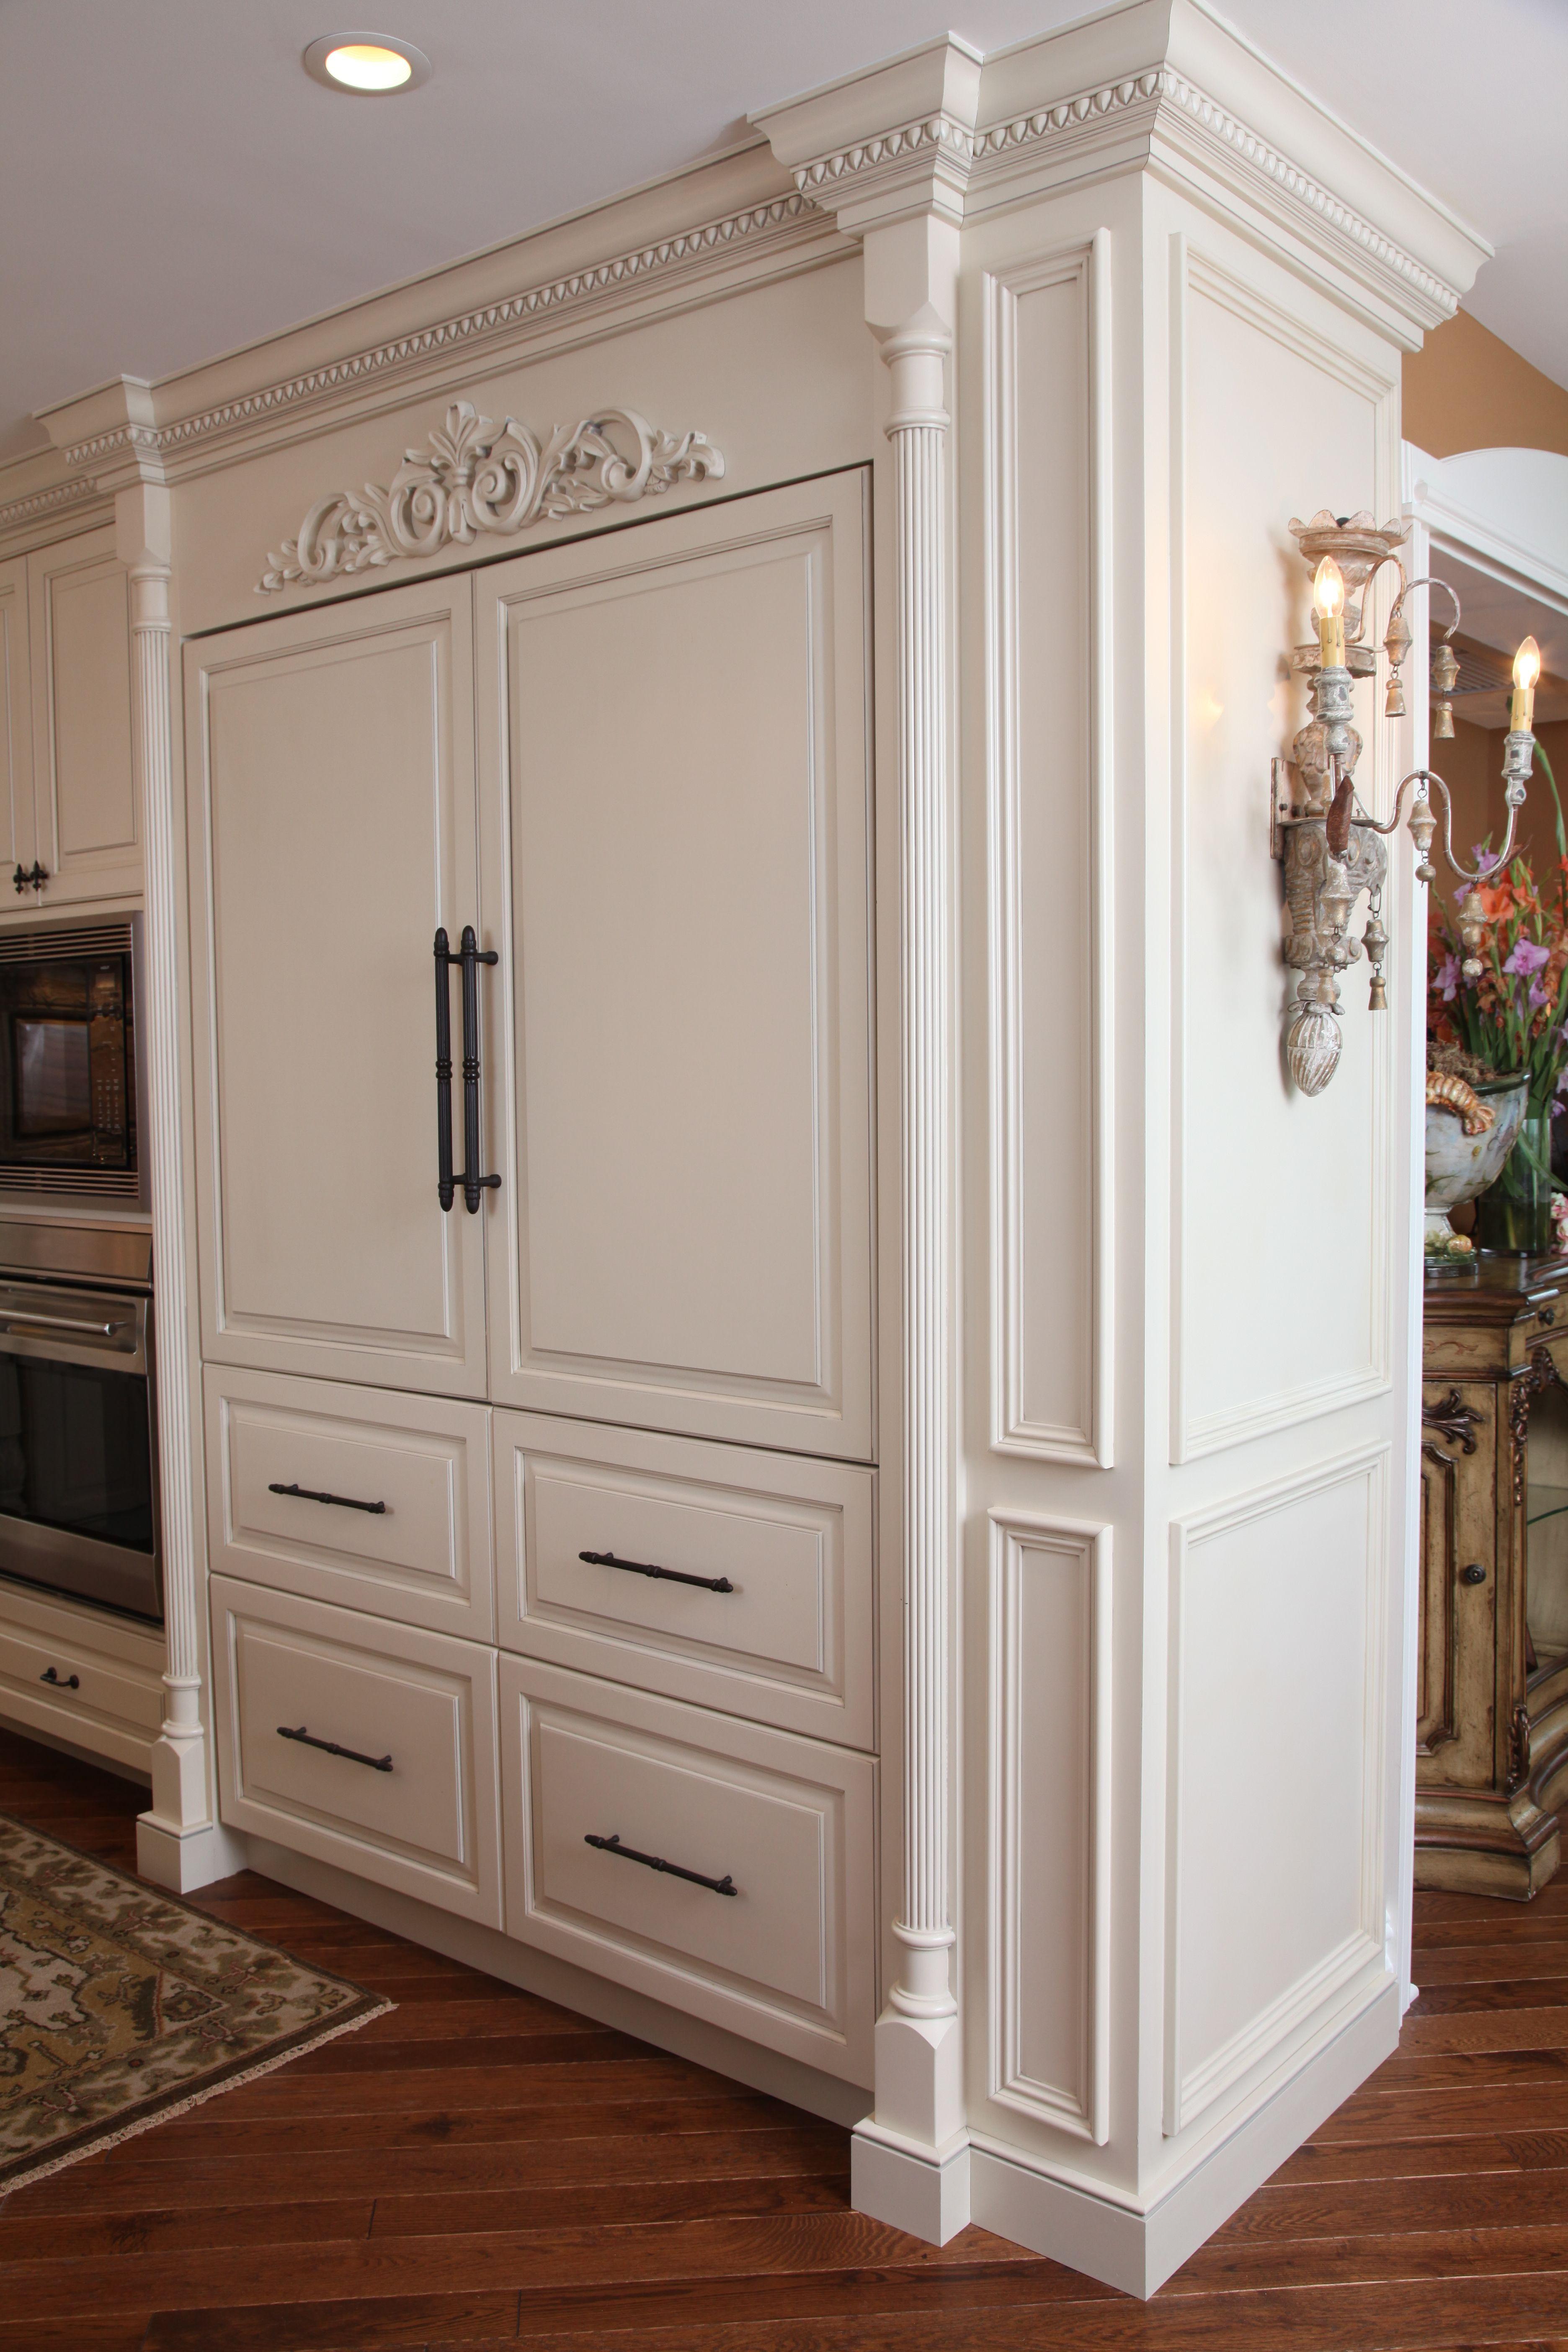 Custom Refrigerator Cabinetry by CVL Designs, Ocean City ...